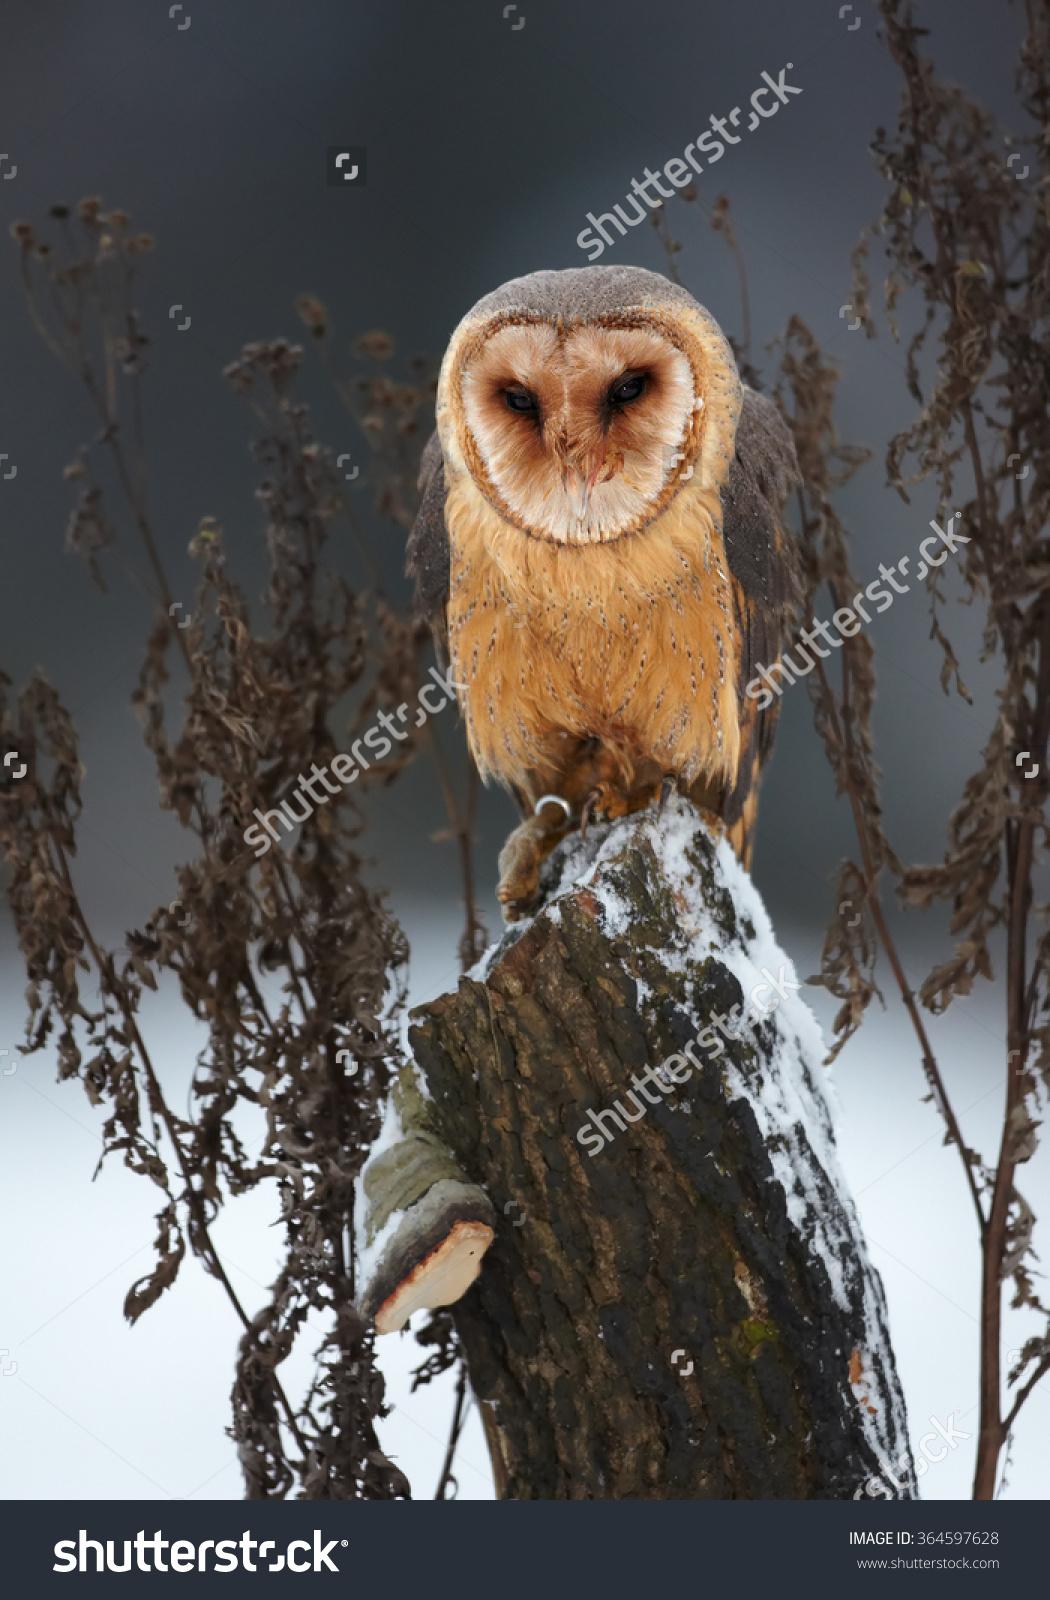 Winter Photo Tyto Alba Guttata Barn Owl Perched On Old Trunk.